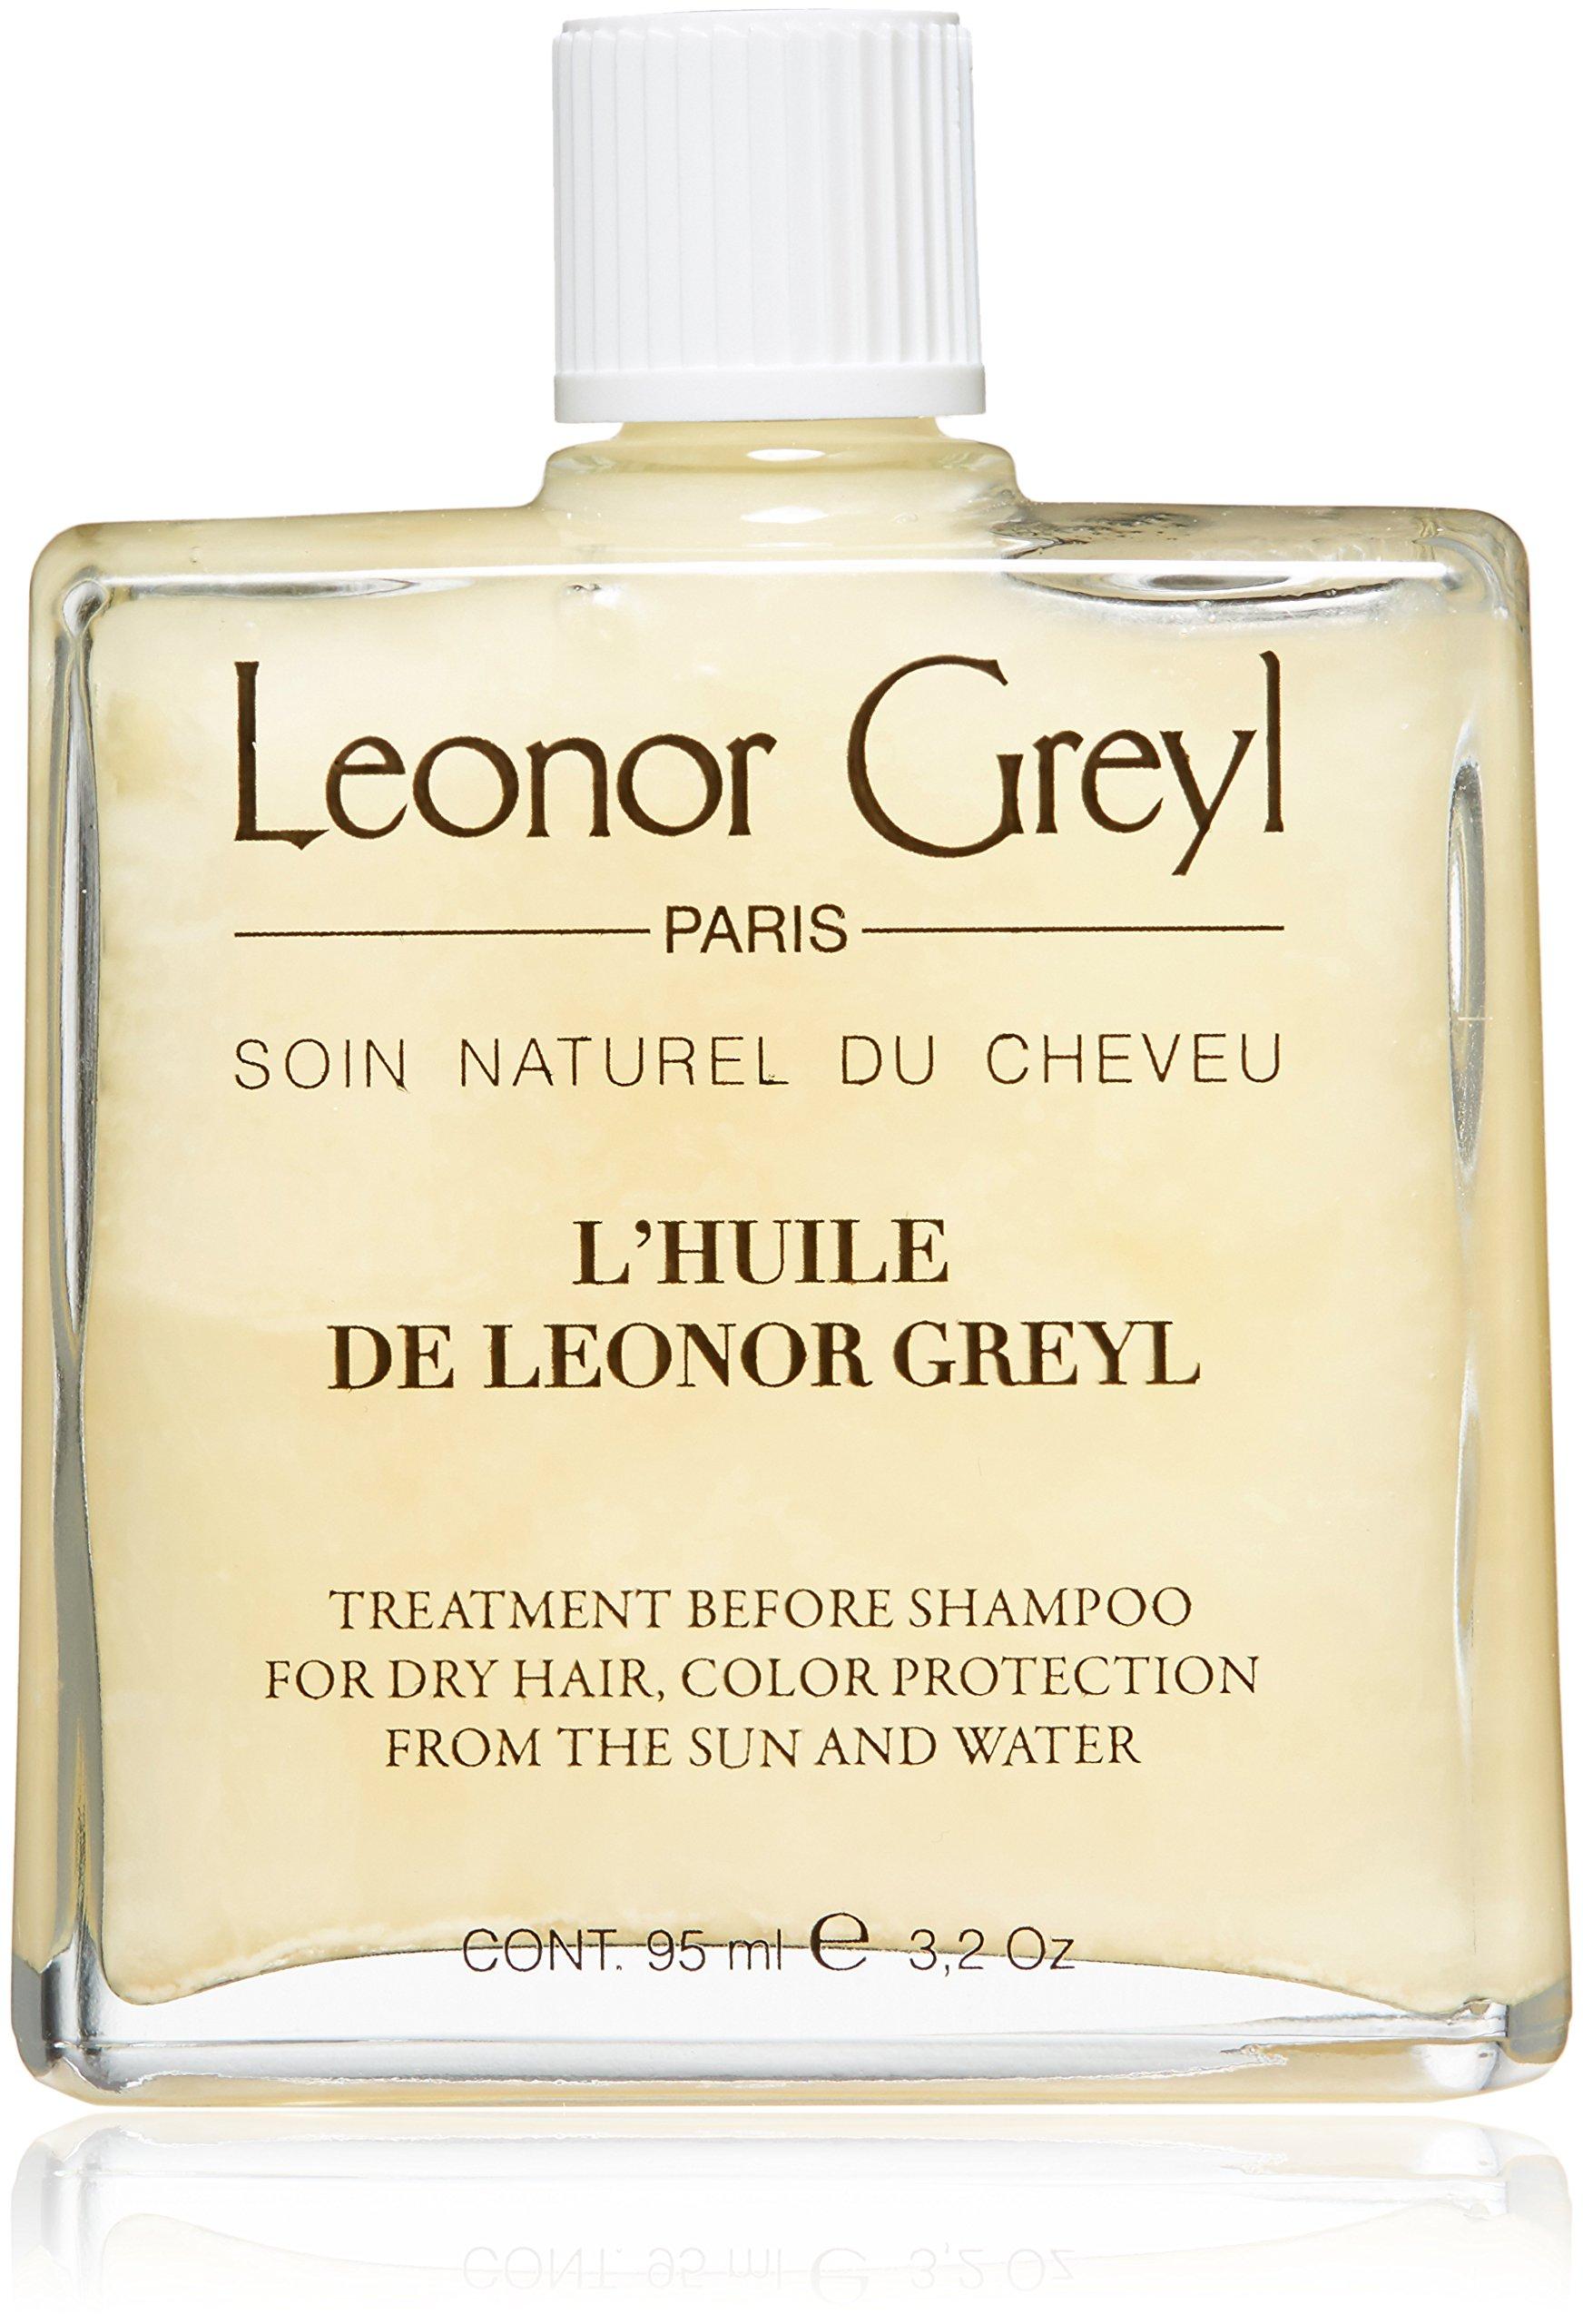 Leonor Greyl Paris L'Huile De Leonor Greyl Paris, 3.2 Oz